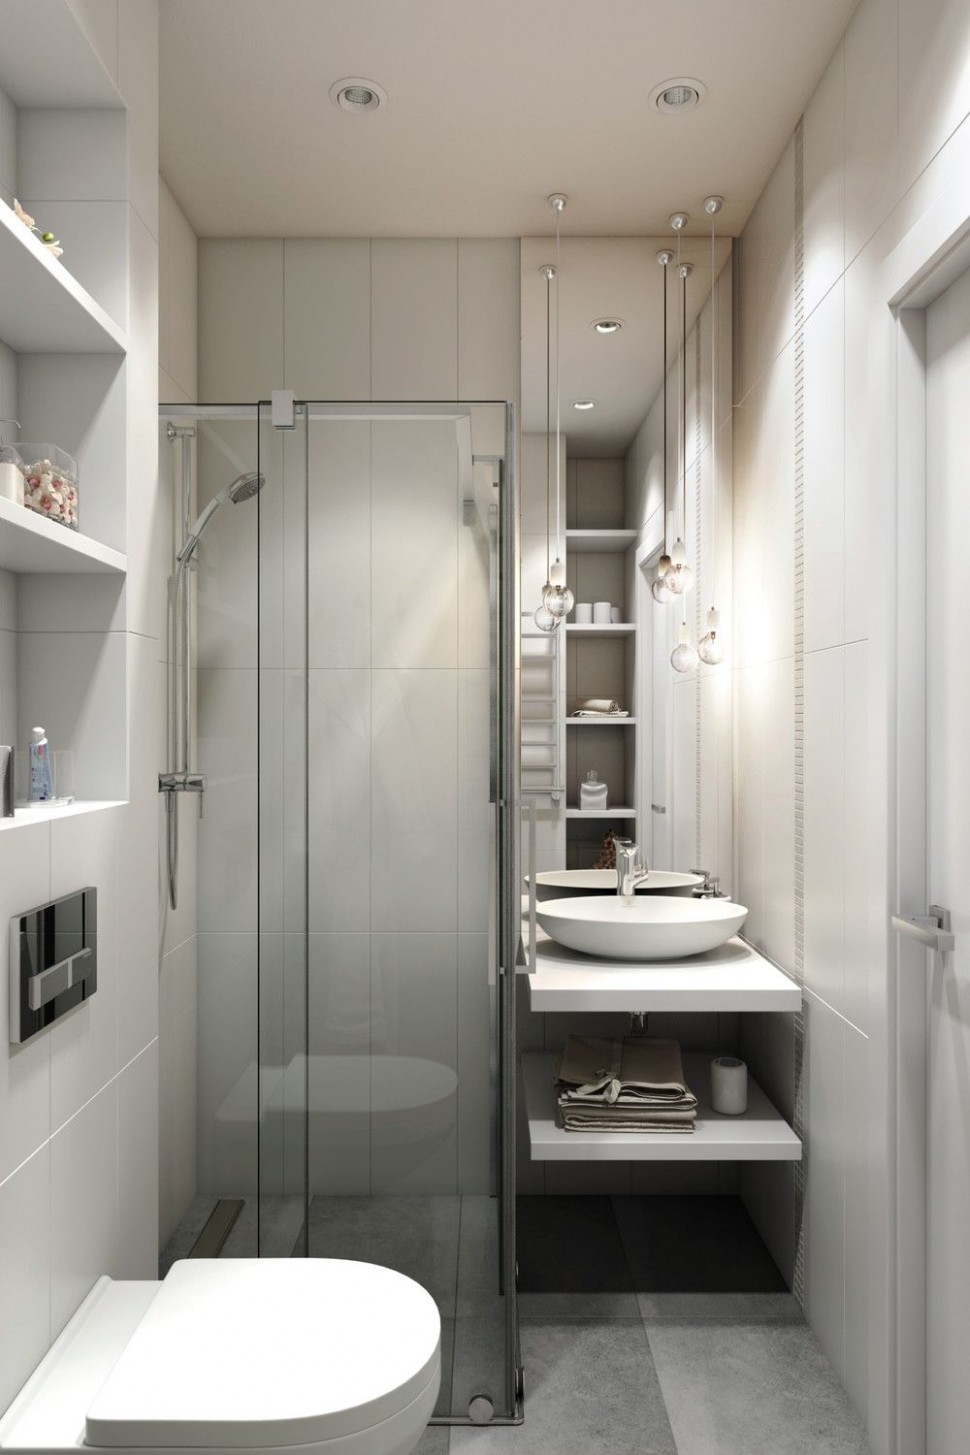 12 Small Apartments Showcase The Flexibility Of Compact Design  - Apartment Washroom Design